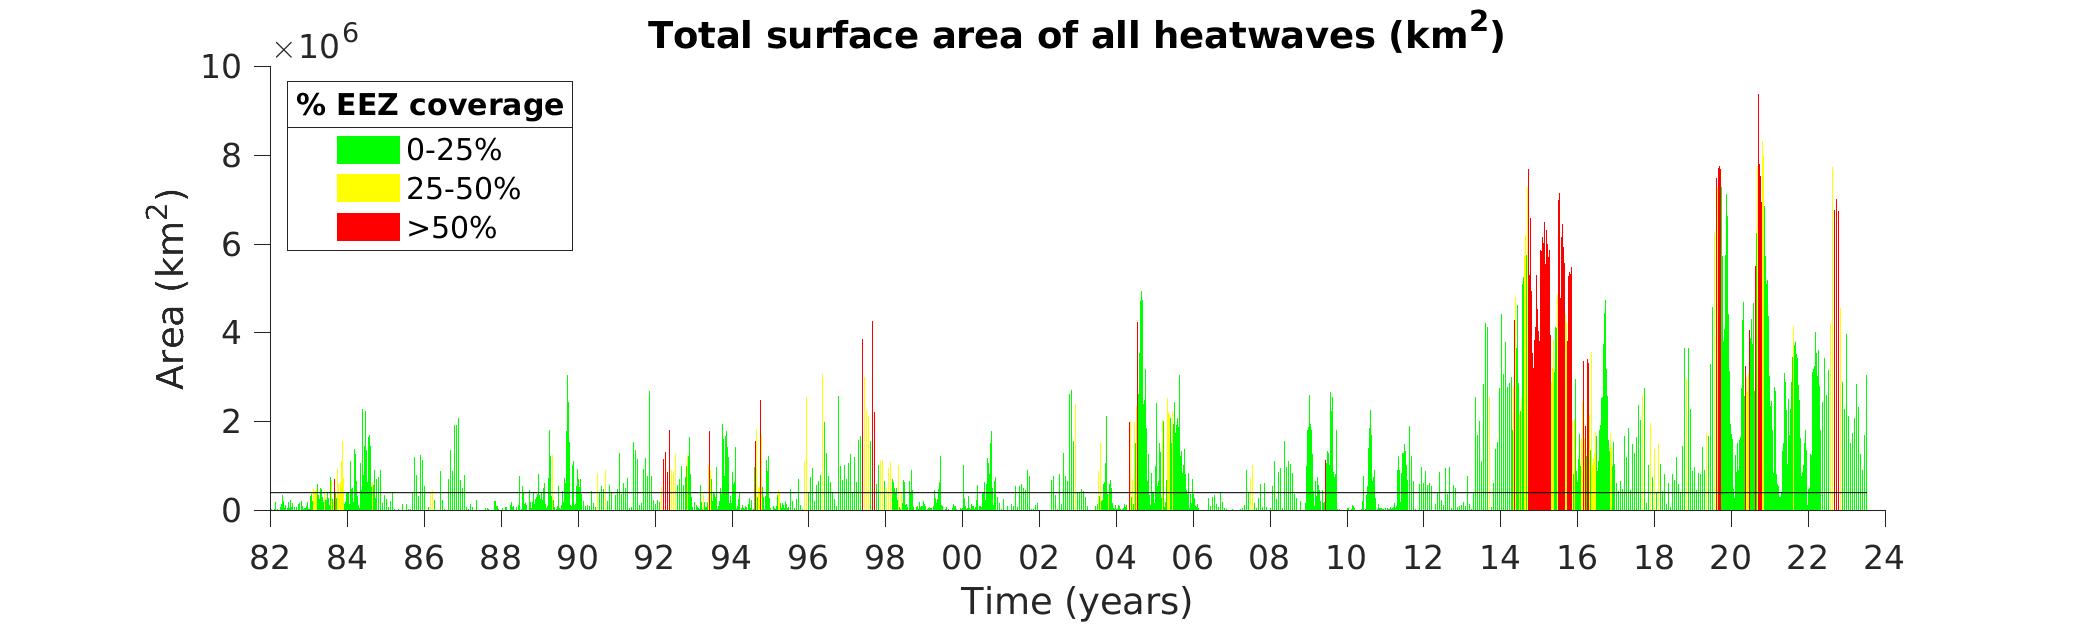 Figure 4 area vs time, 1982 to present